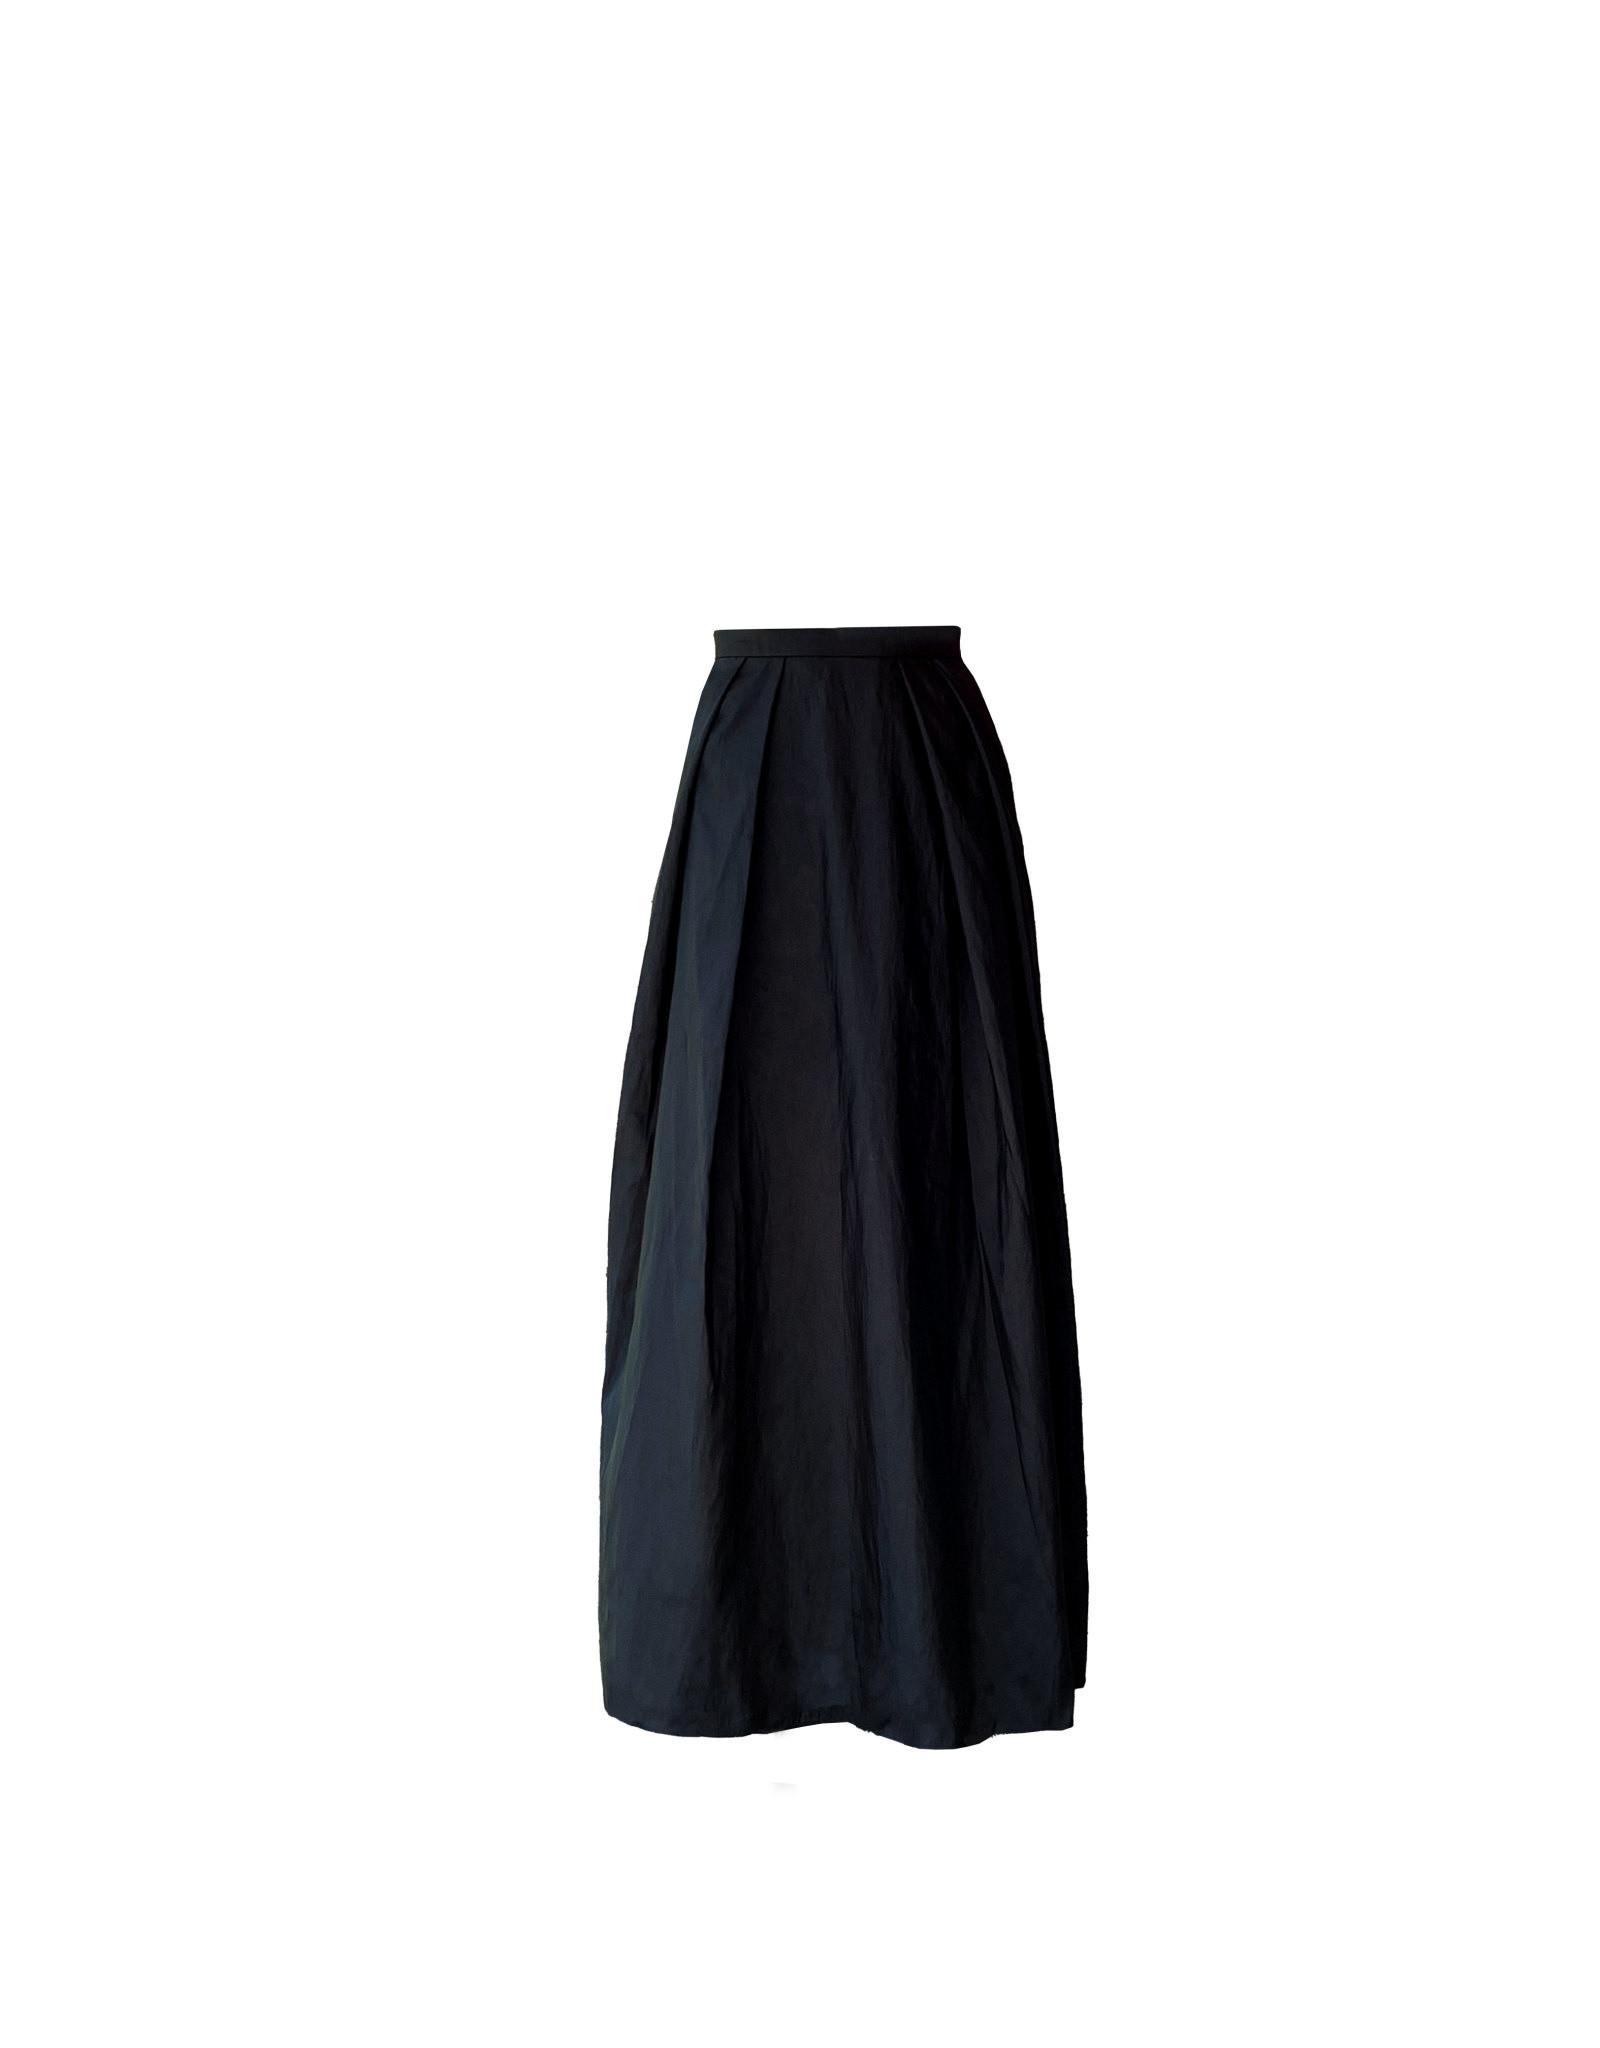 Alex evenings long full taffeta skirt size M